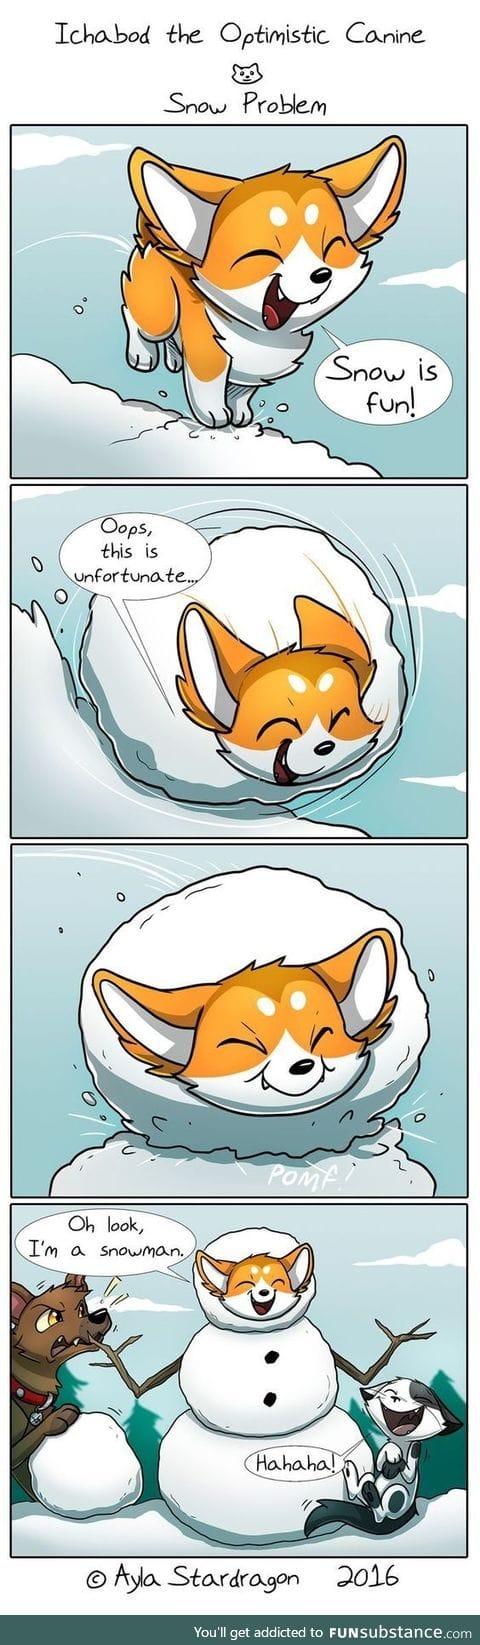 Puppy? Fox? idk it looks cute